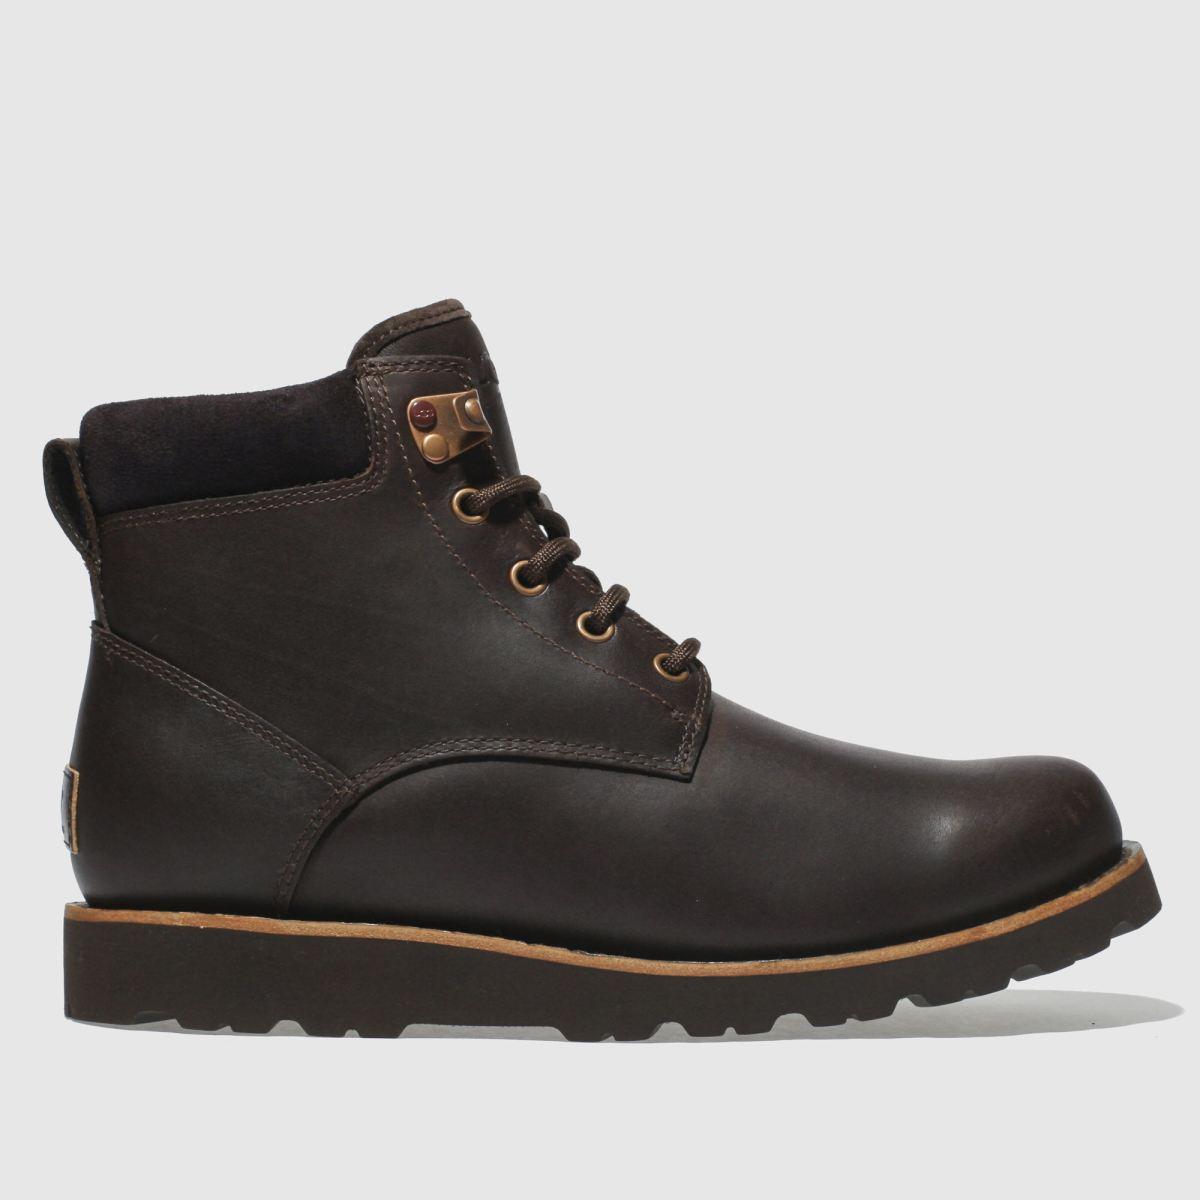 Ugg Dark Brown Seton Tall Boots